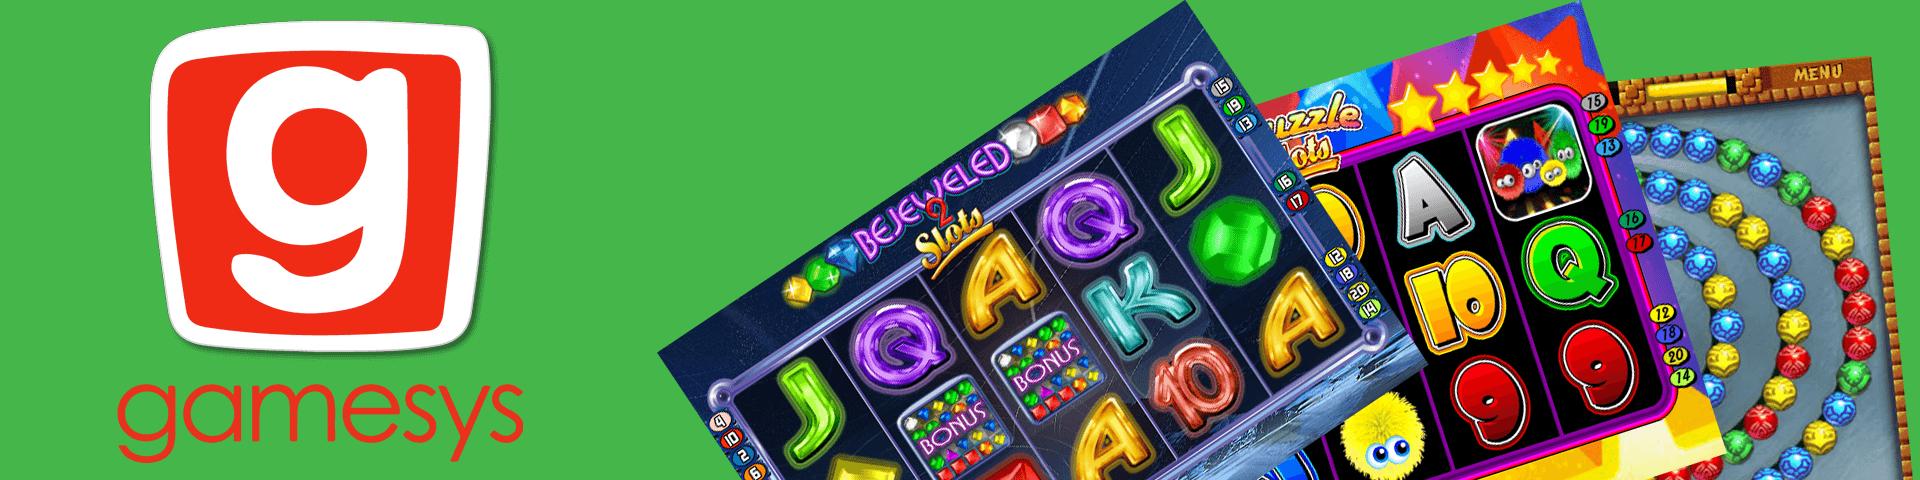 jocuri-casino-Gamesys-multabafta-slider